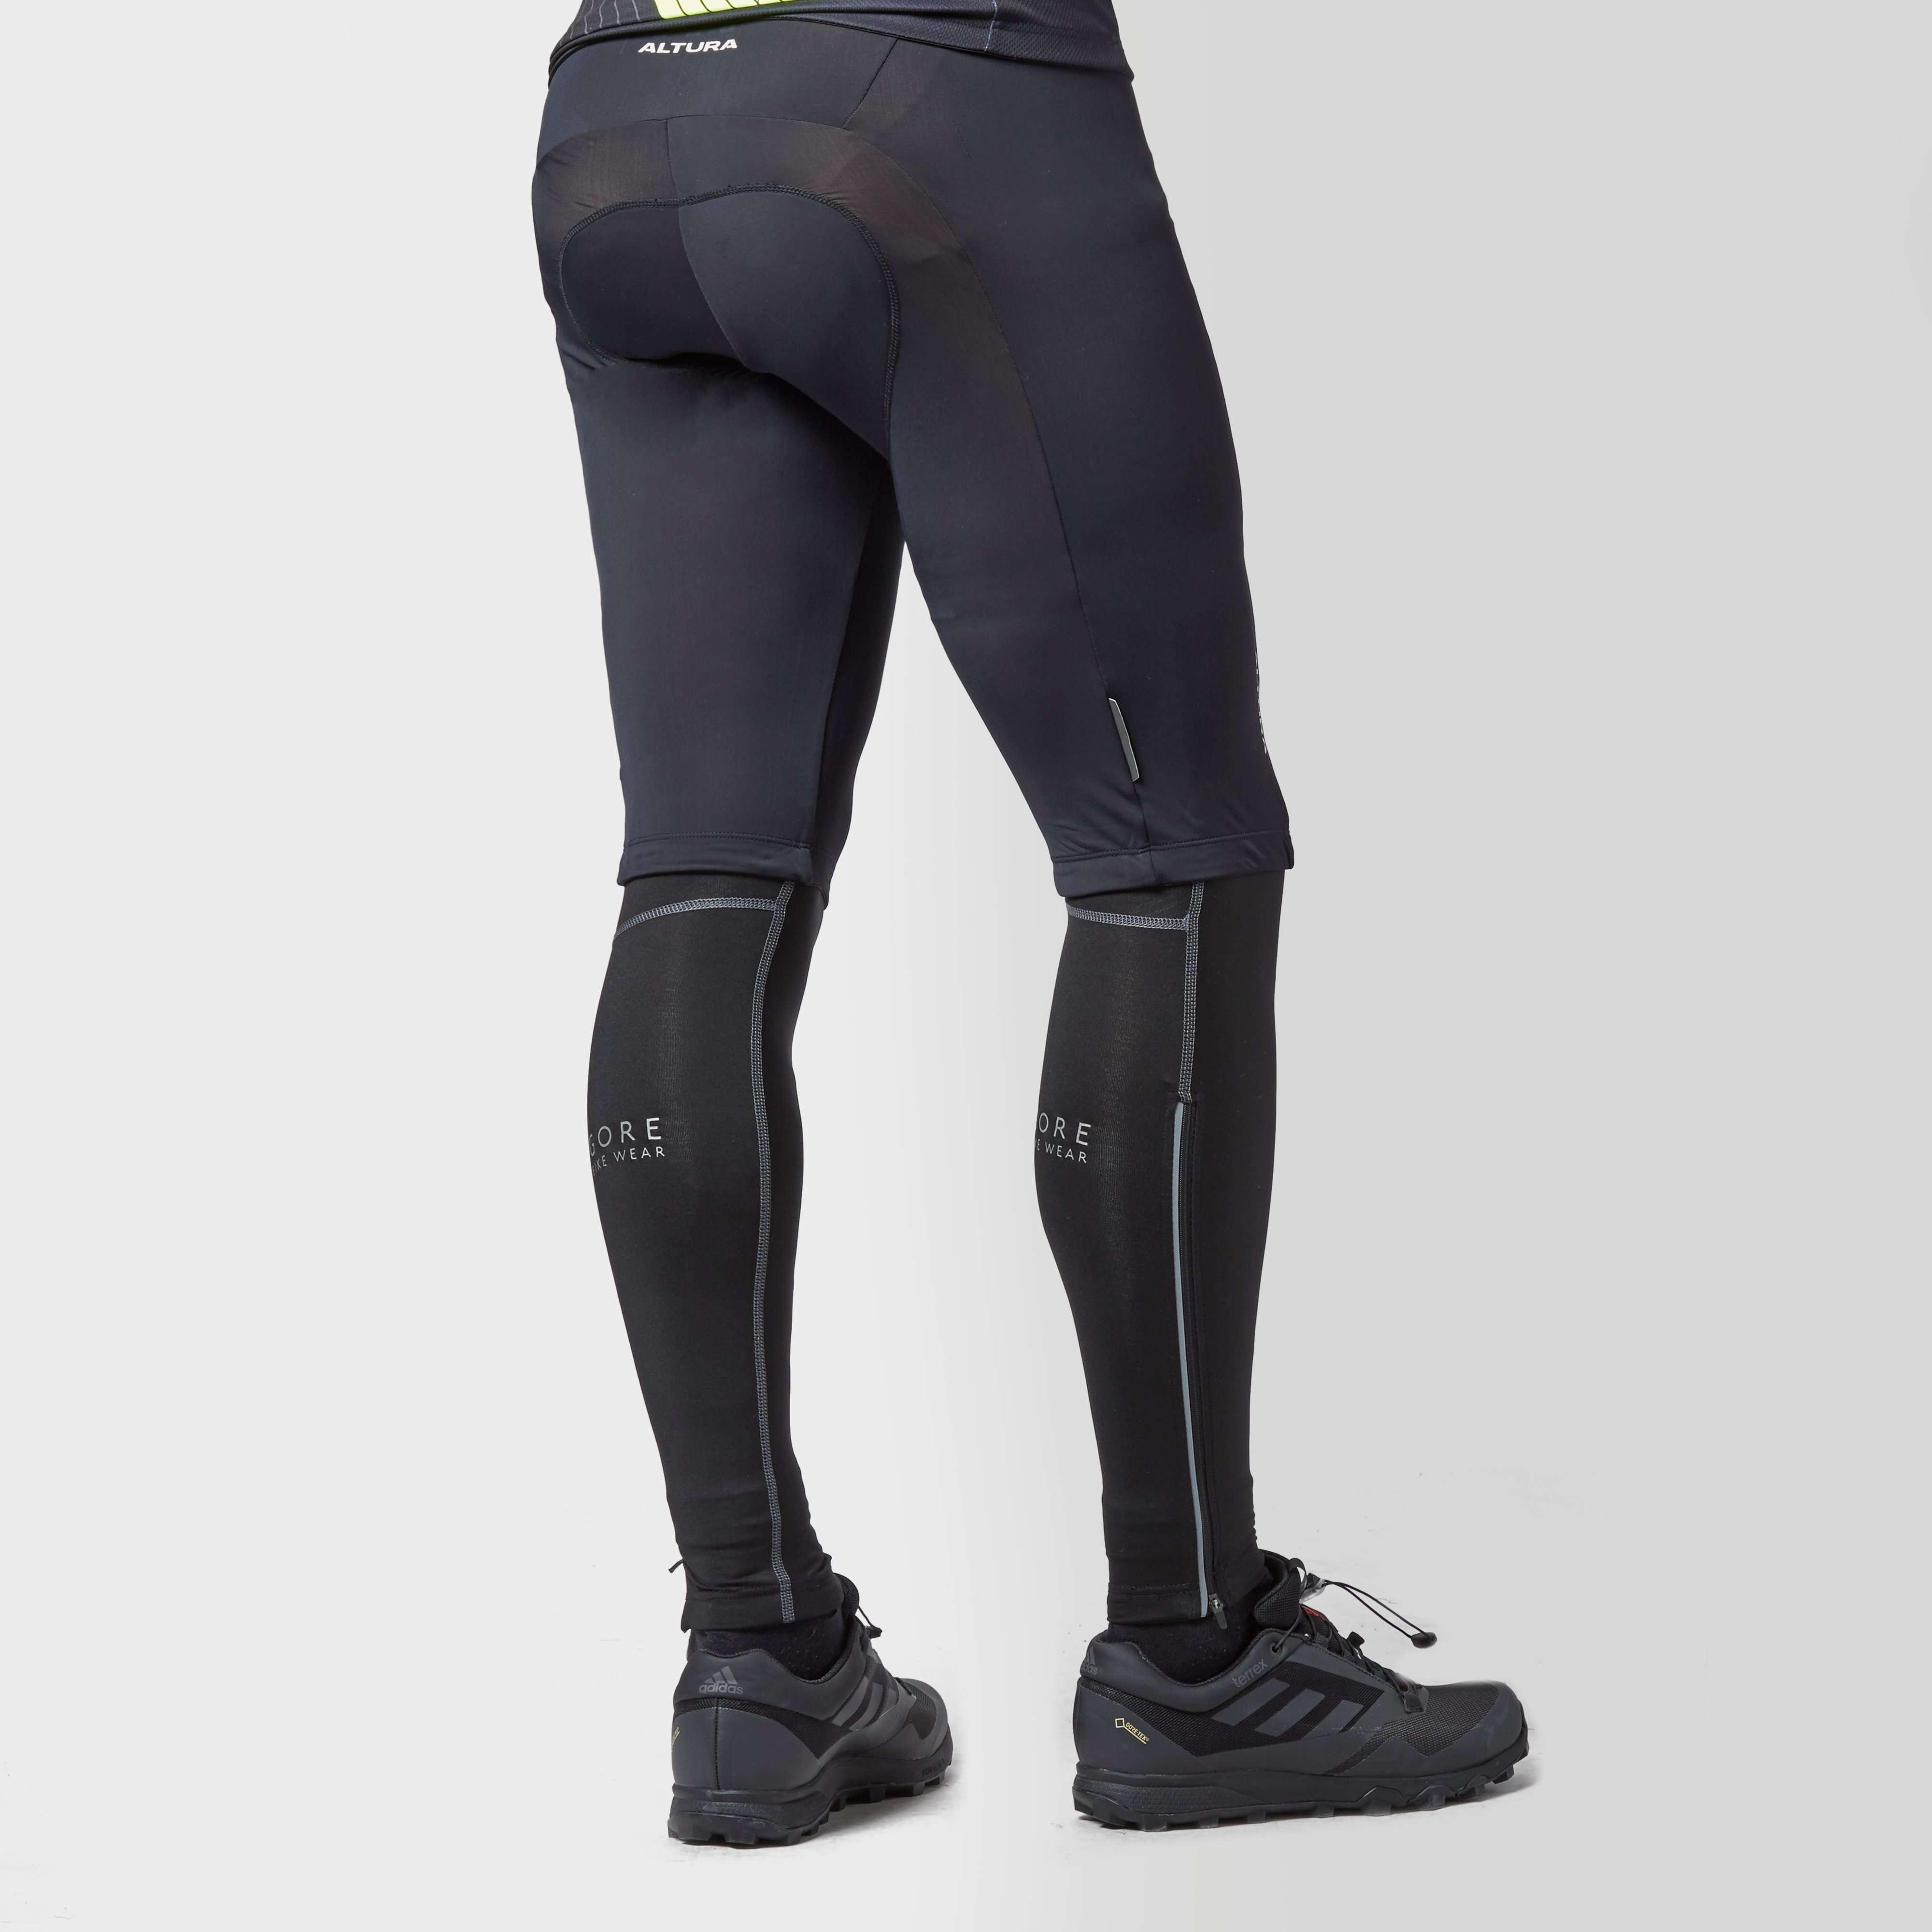 GORE Universal 2.0 Leg Warmers